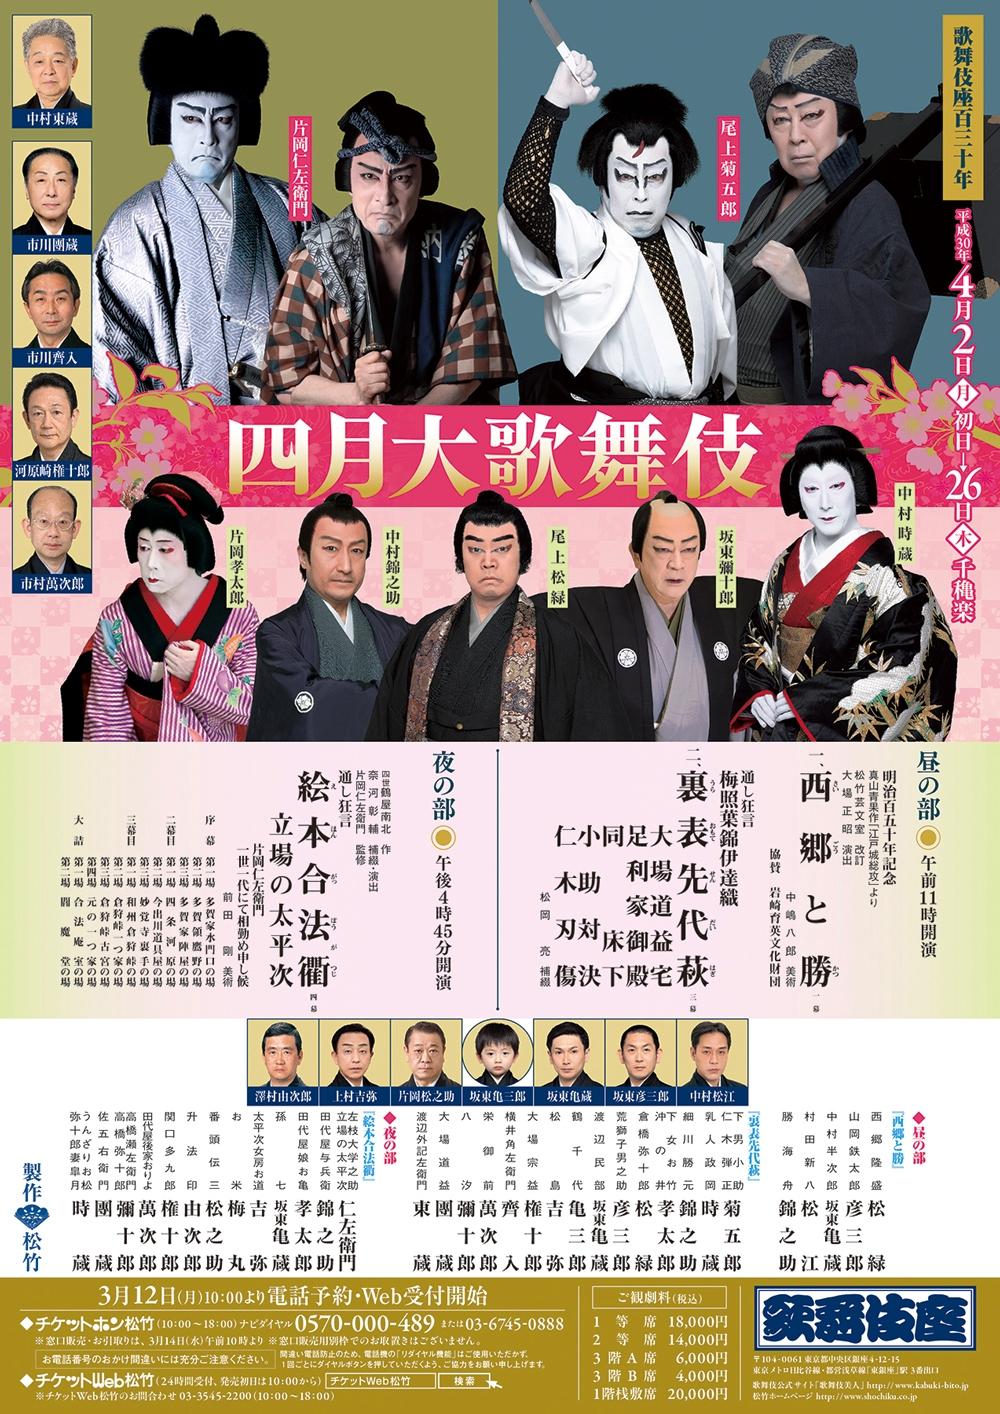 kabukiza_201804_f2_3042193de748b51ce1cc6542886c9903